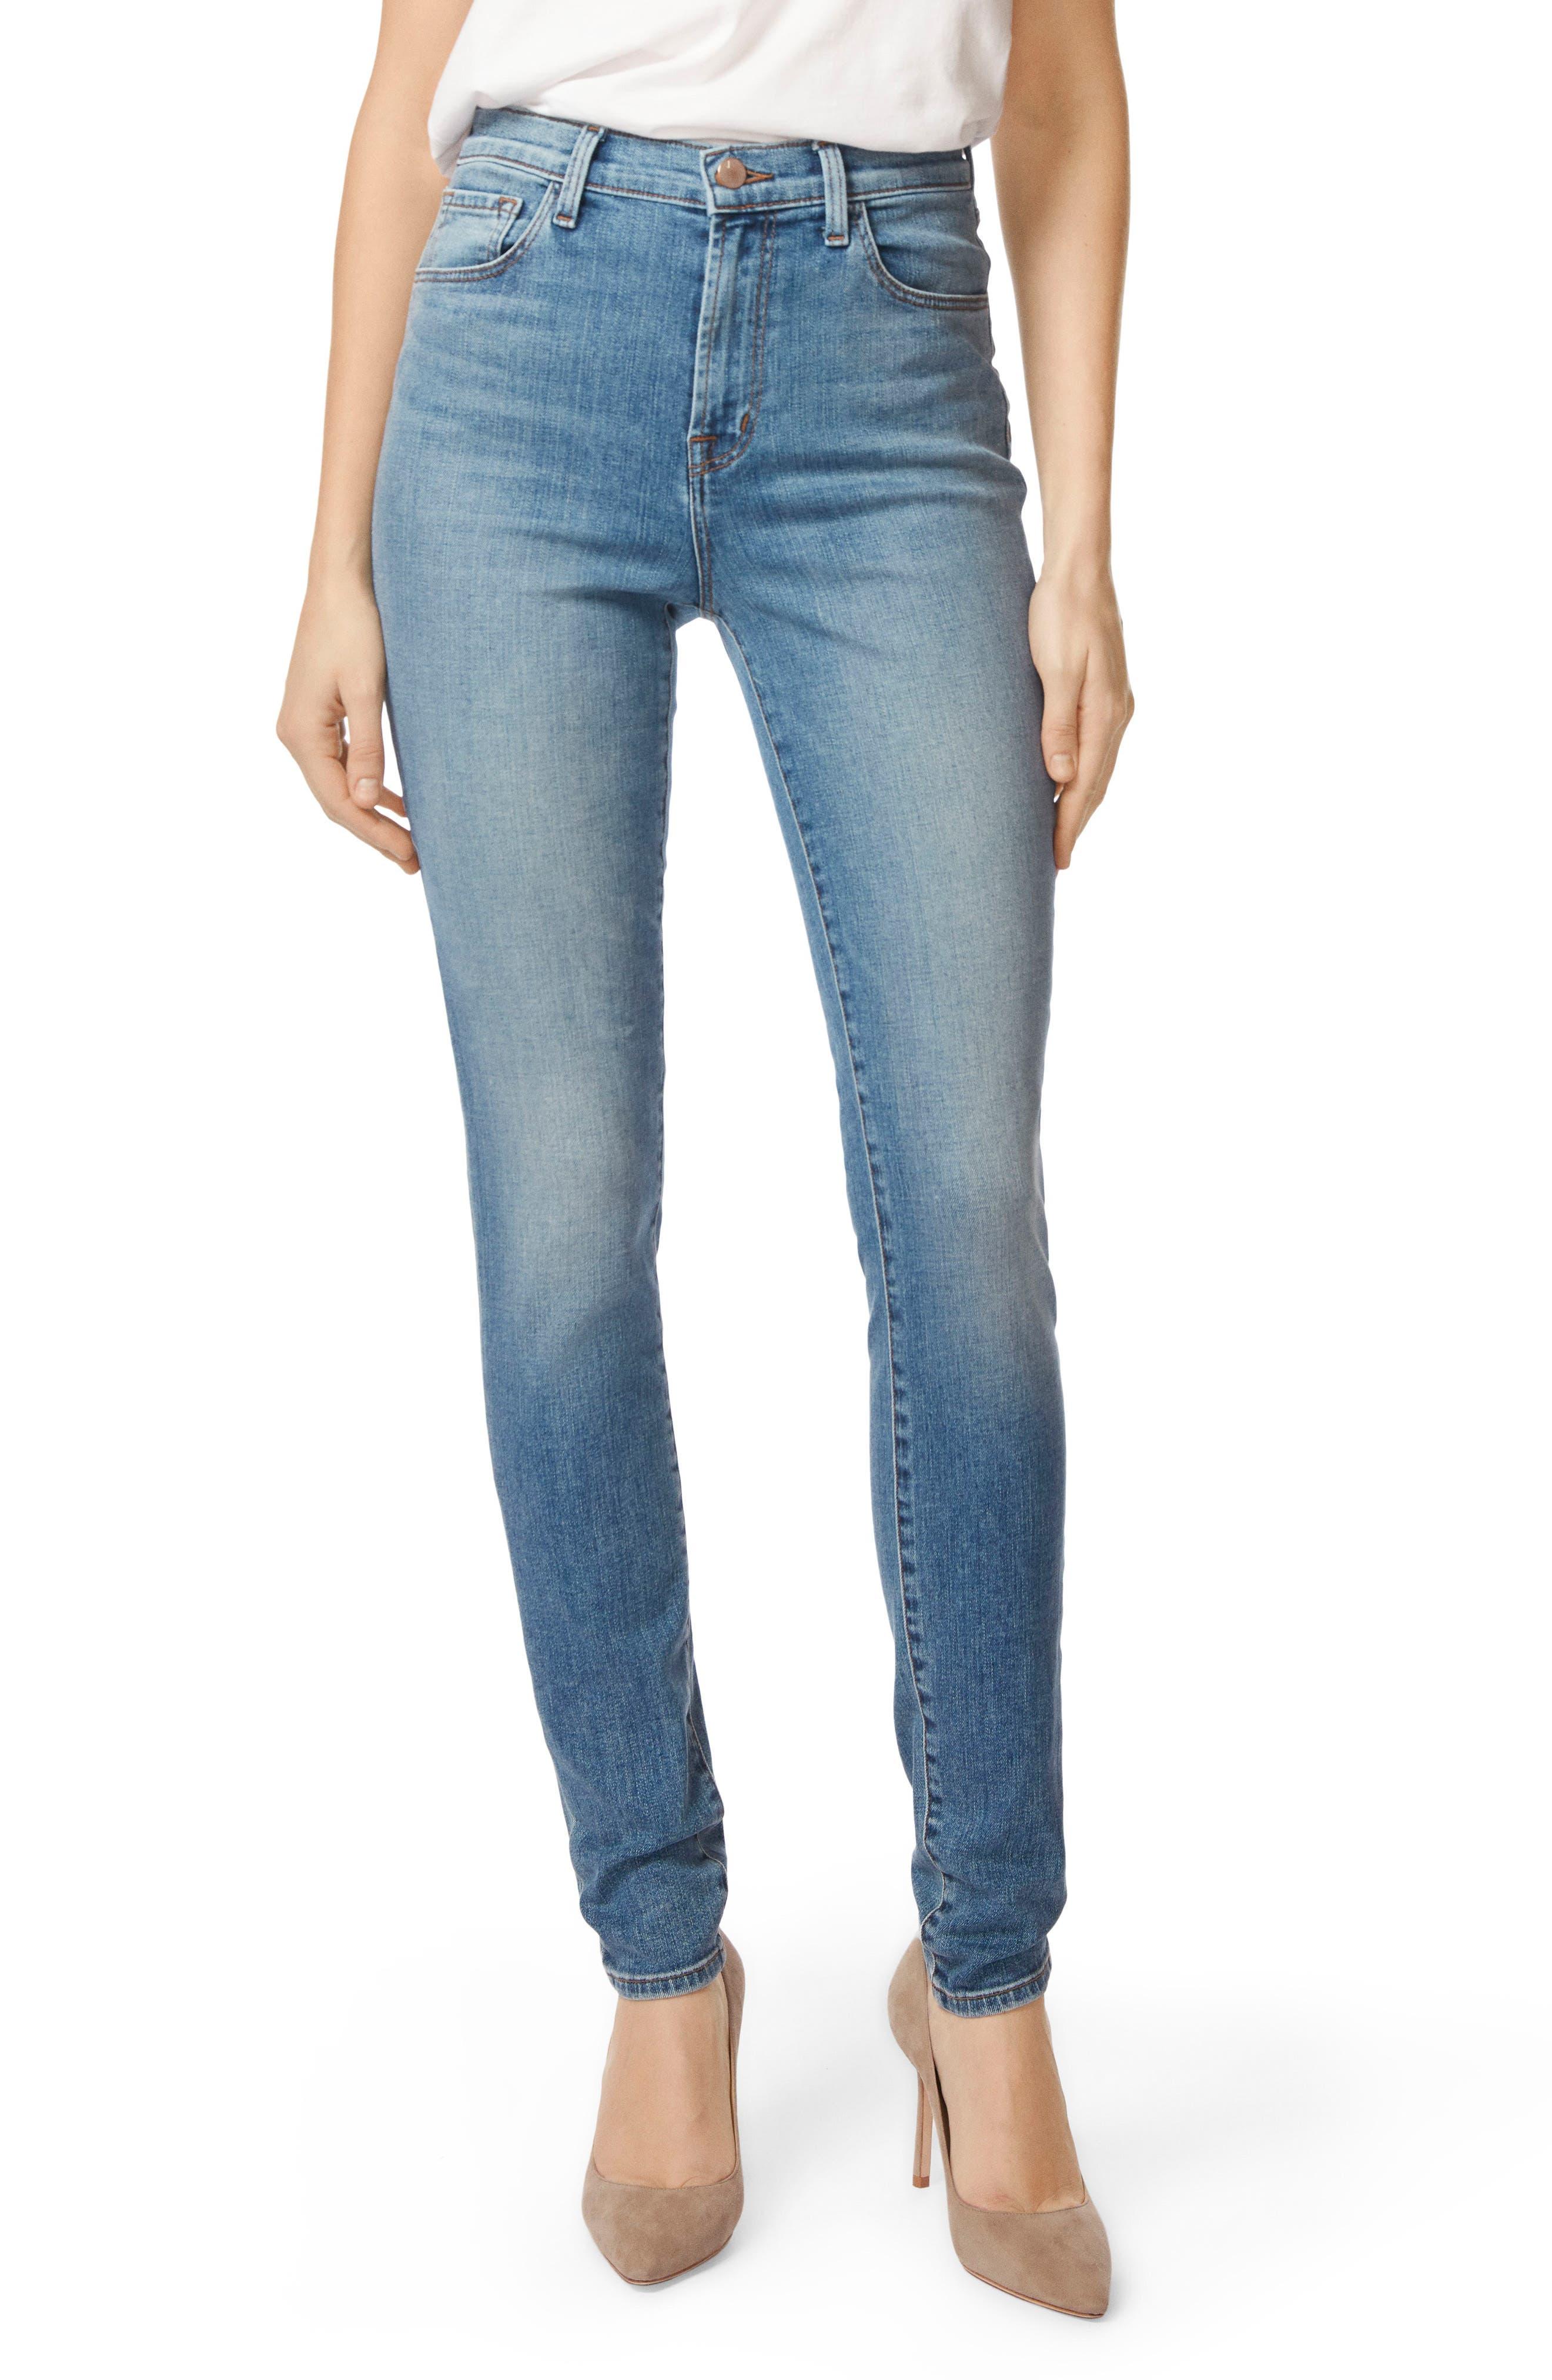 Carolina Super High Waist Skinny Jeans,                         Main,                         color, 400